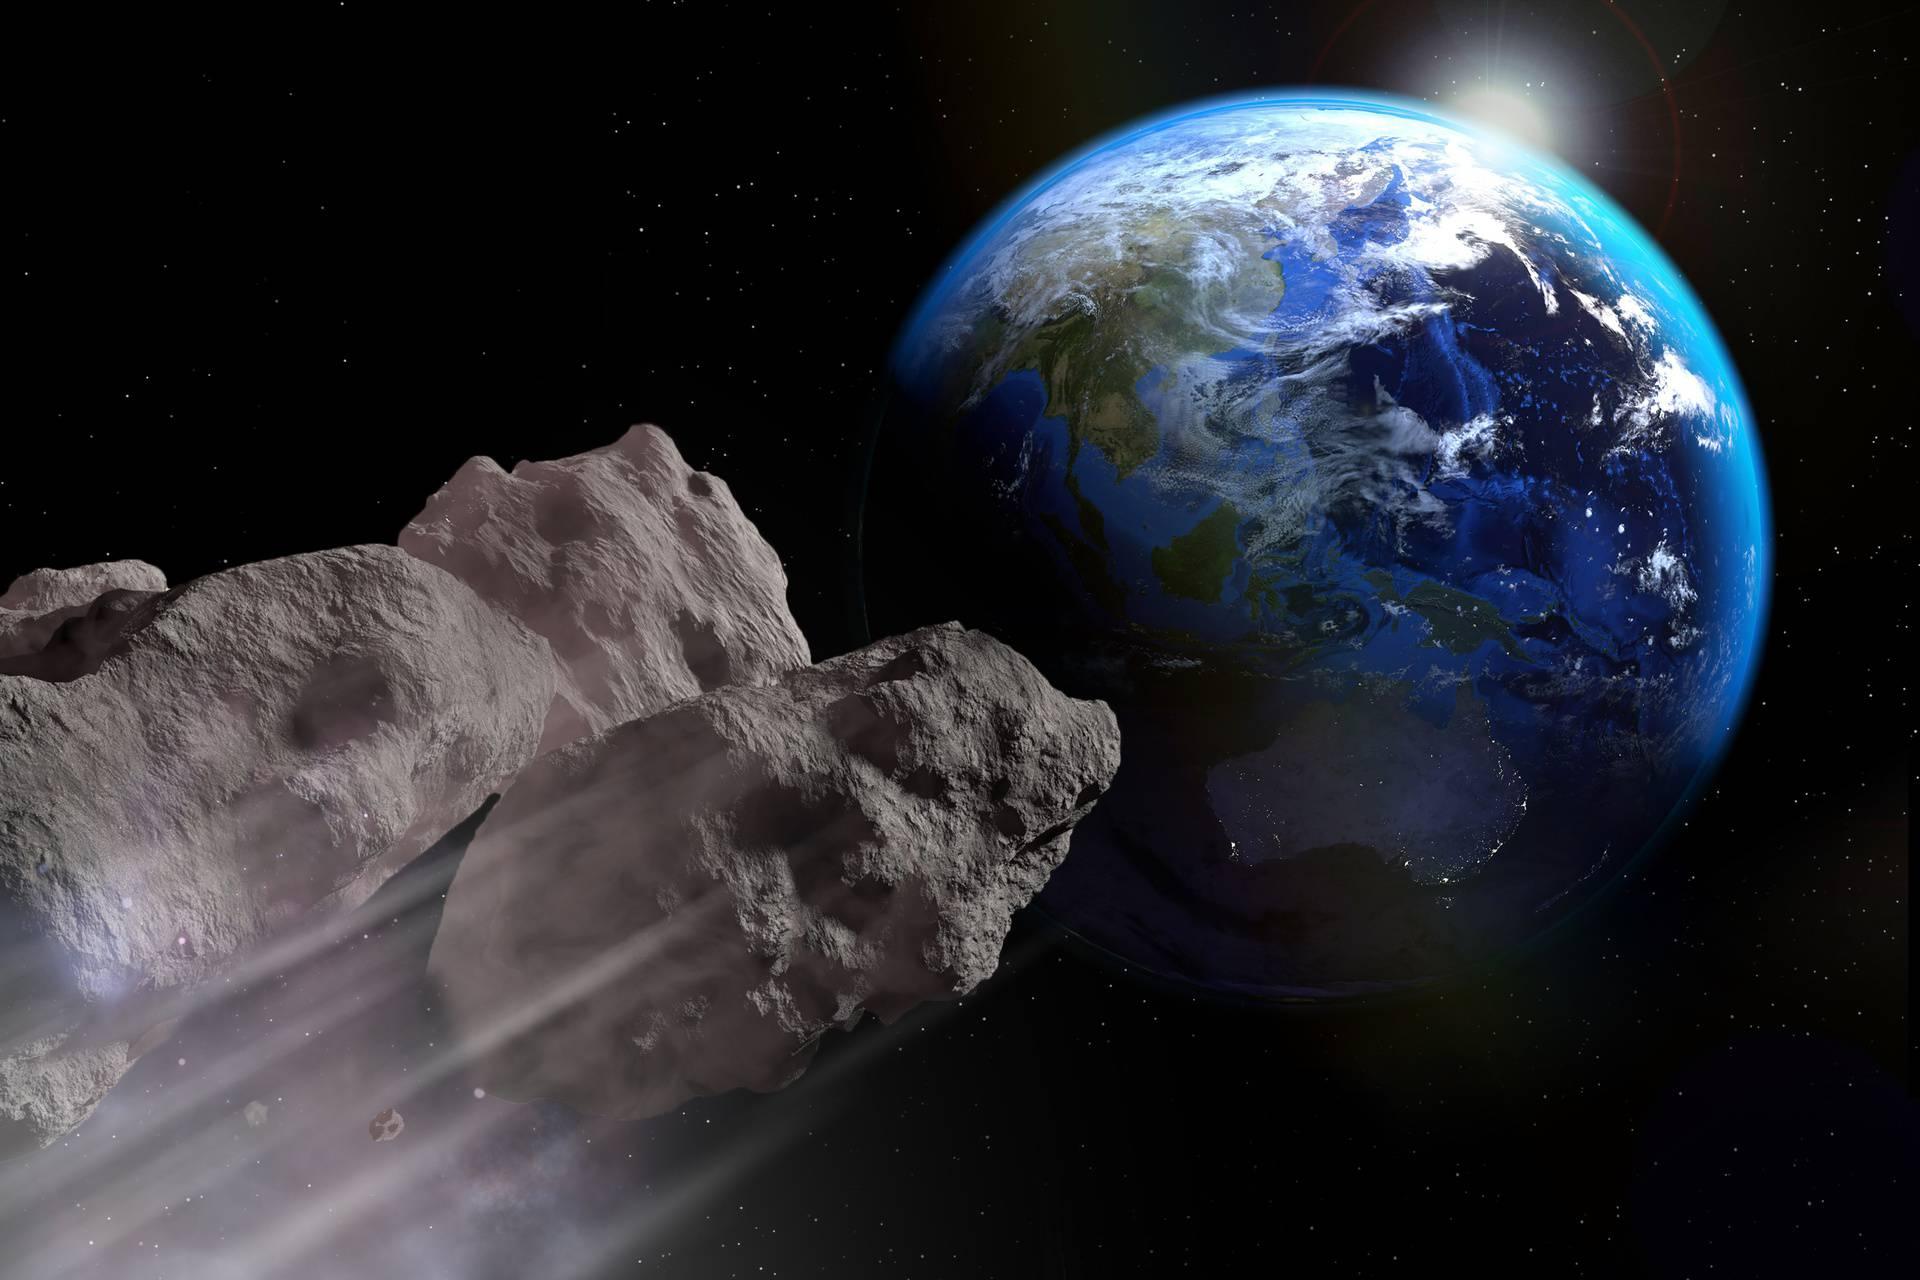 Asteroid juri prema Zemlji: Ima 0,41 posto šanse da nas pogodi!